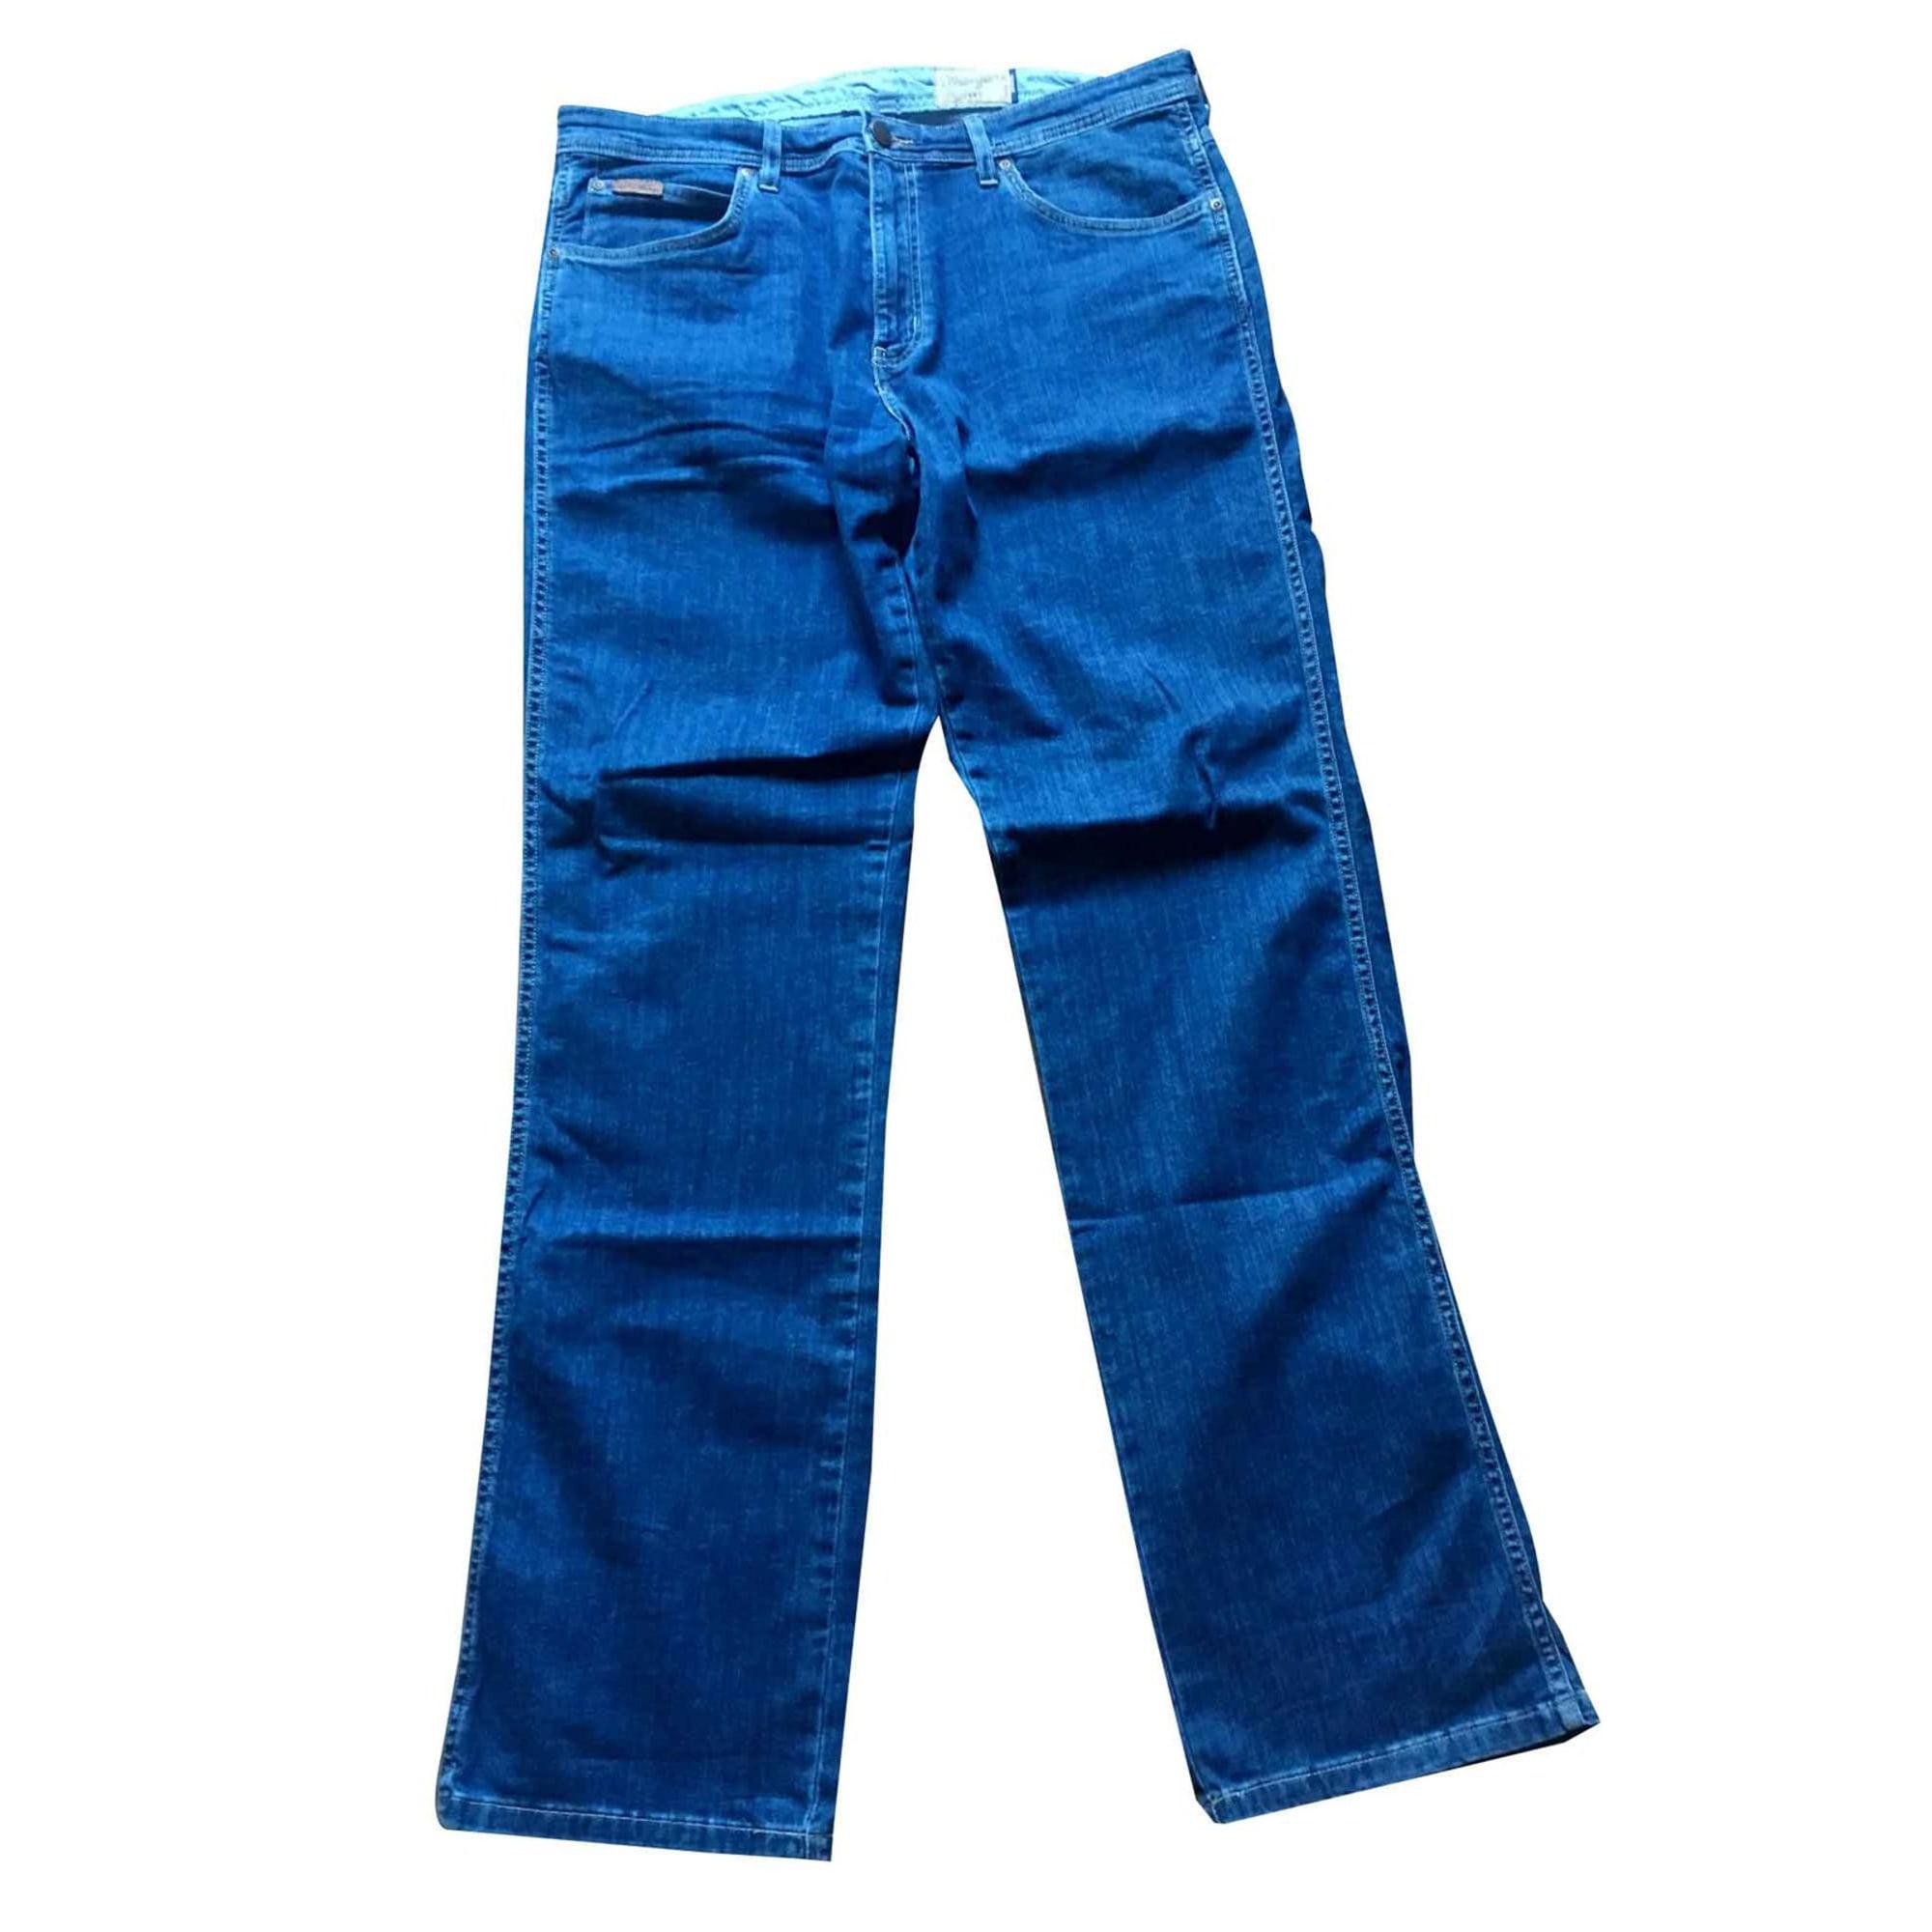 Jeans droit WRANGLER Bleu, bleu marine, bleu turquoise